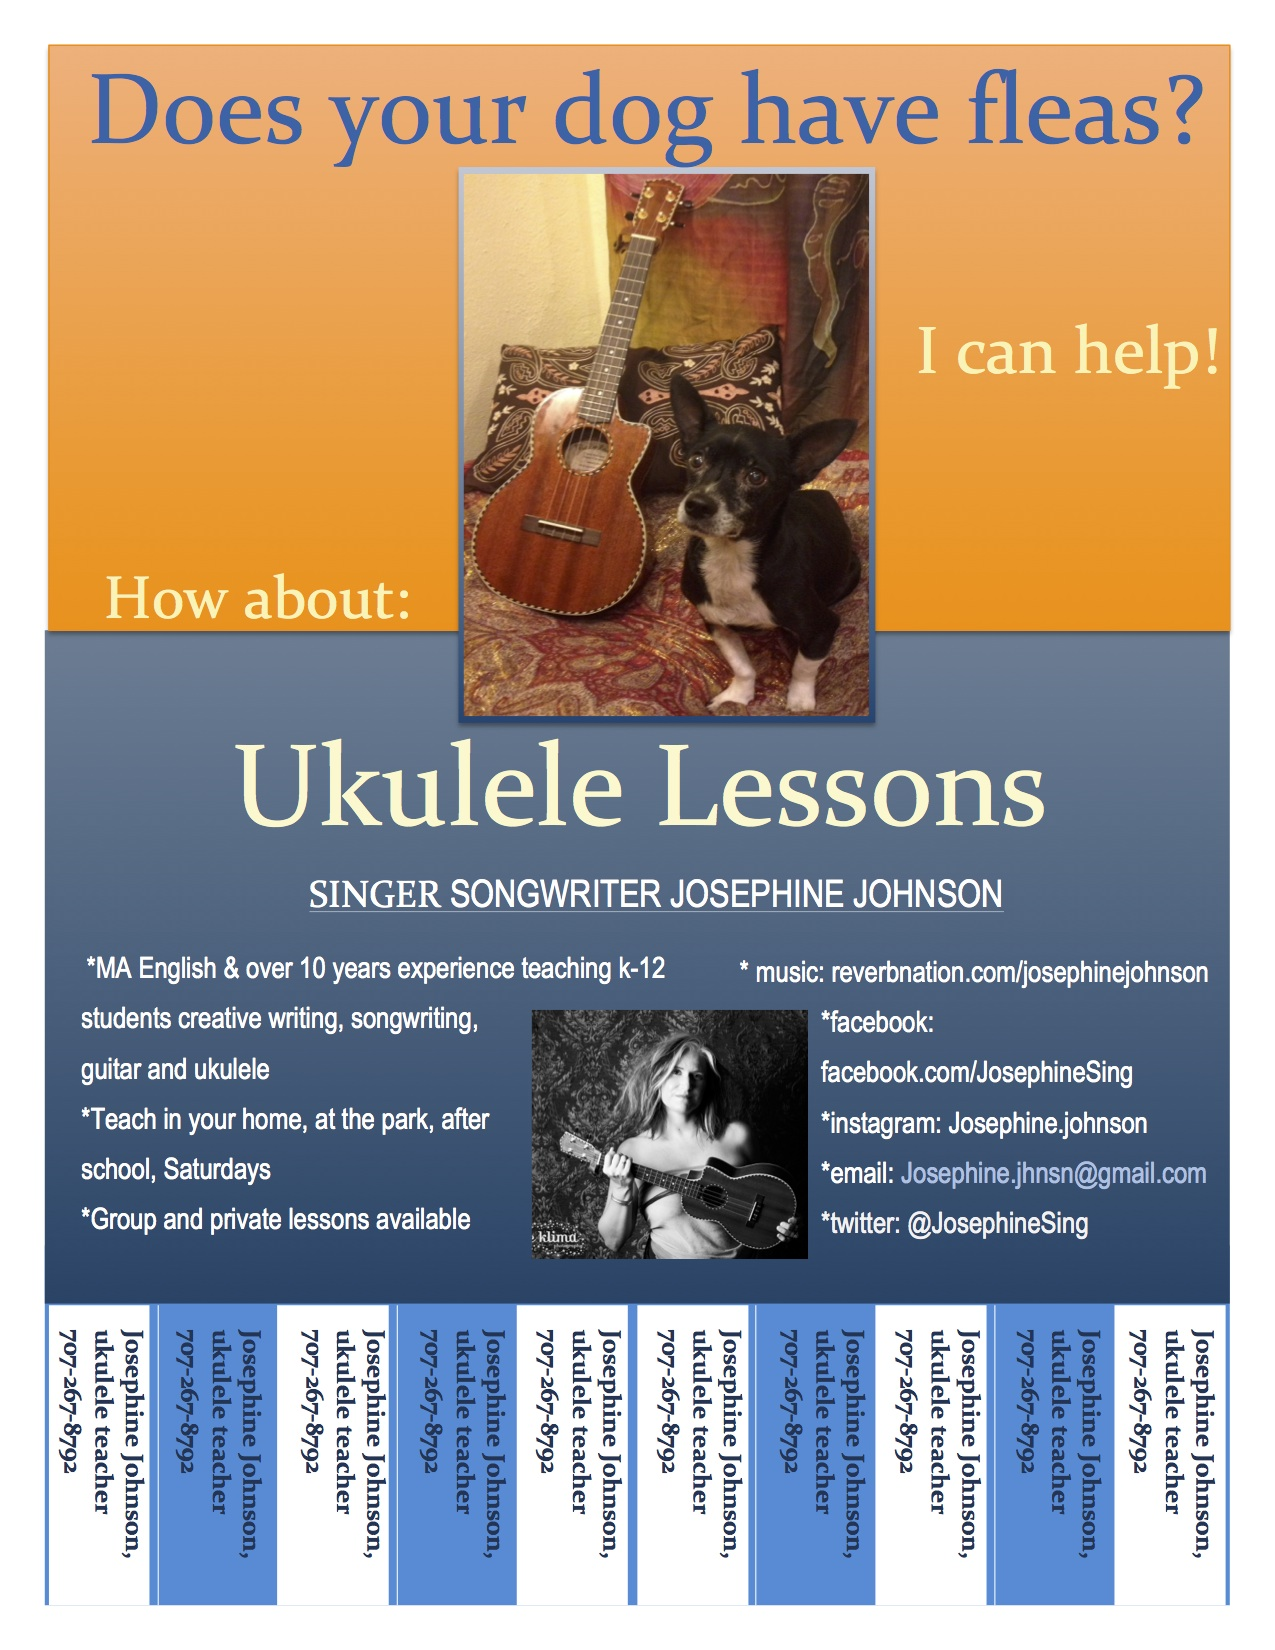 Sanyo gxbm manual ebook array steven universe theme song ukulele chords steven universe steven rh 4kepics com fandeluxe Images